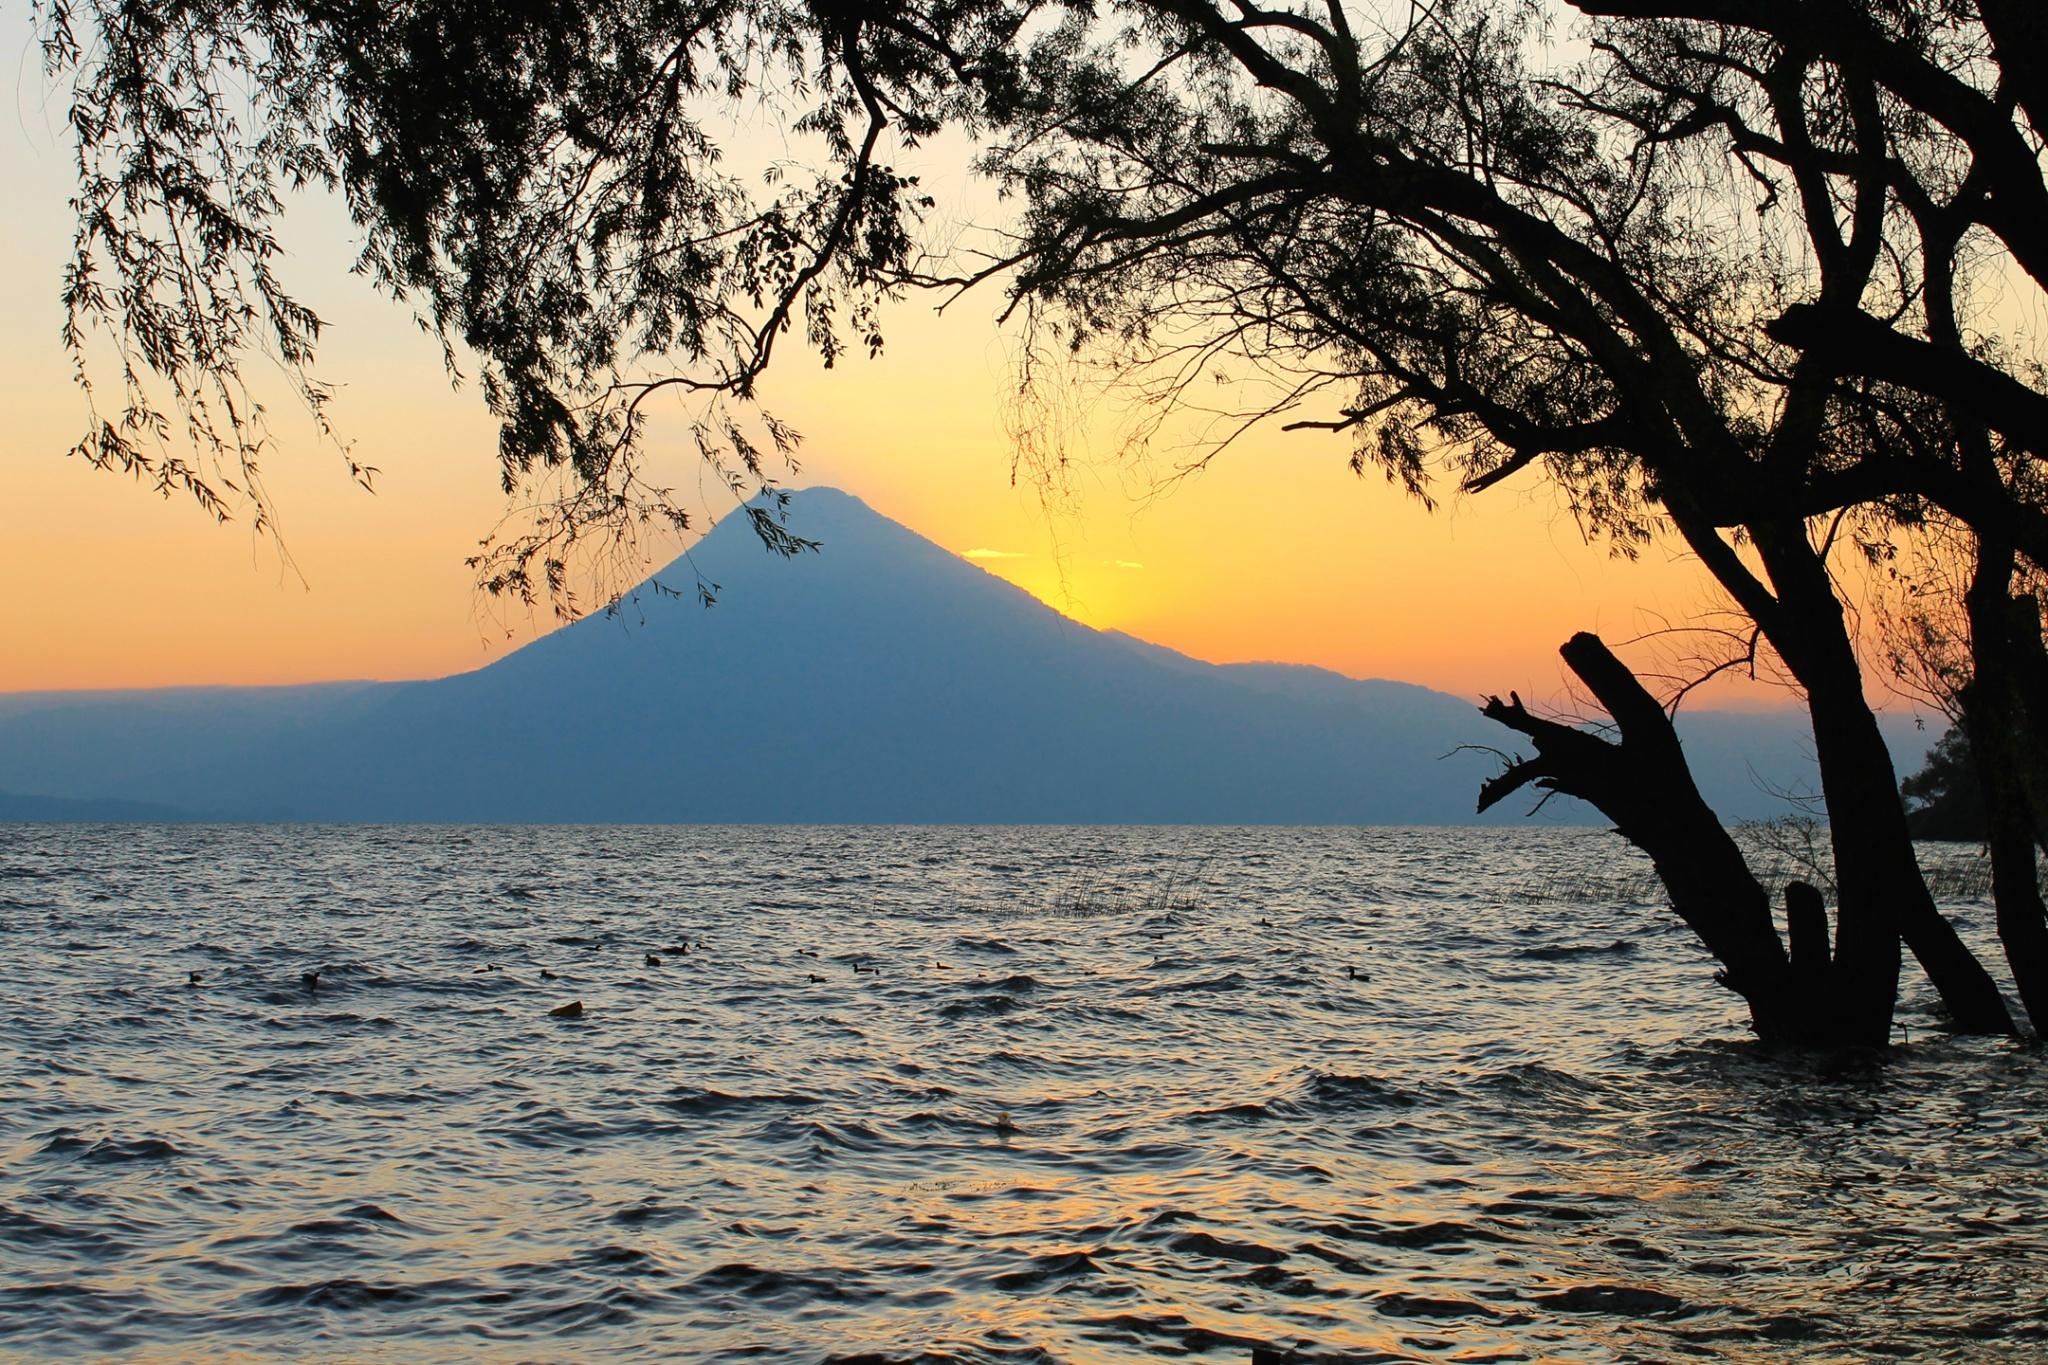 Sunset behind volcano in from the Santa Catarina Palopó dock in Lake Atitlan, Guatemala.